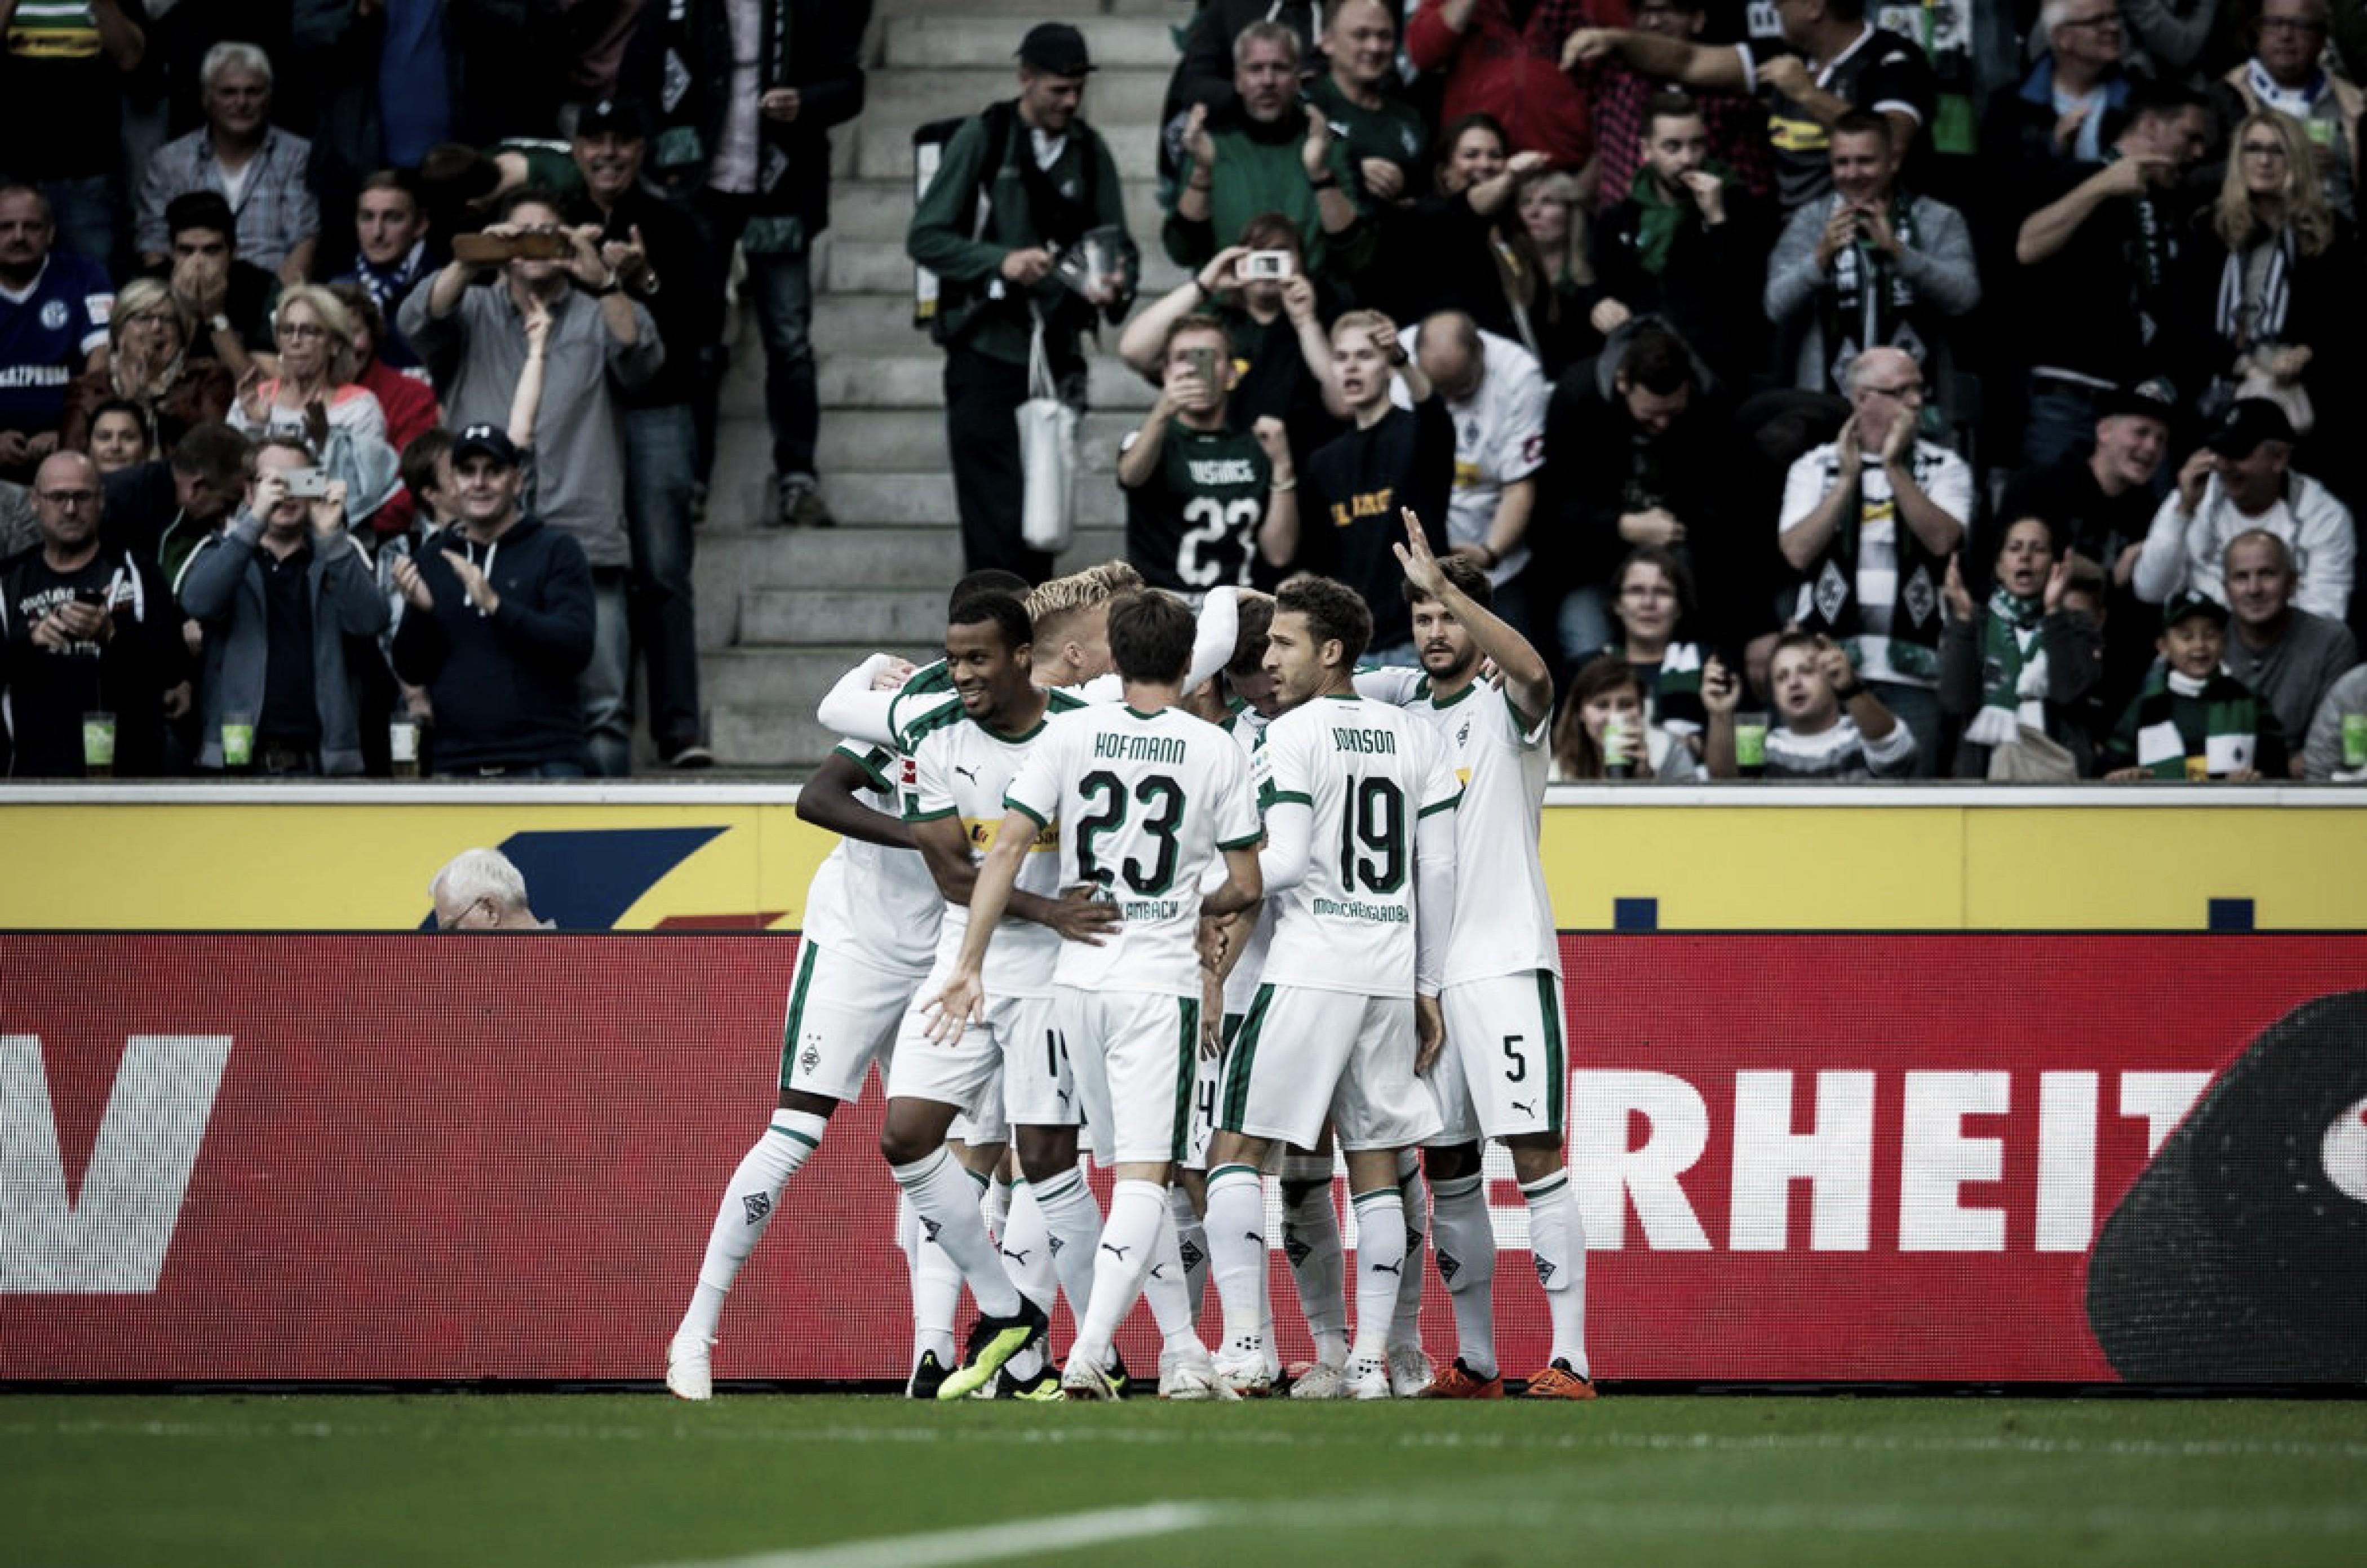 Herrmann quebra jejum, Borussia Mönchengladbach vence e aumenta crise no Schalke 04